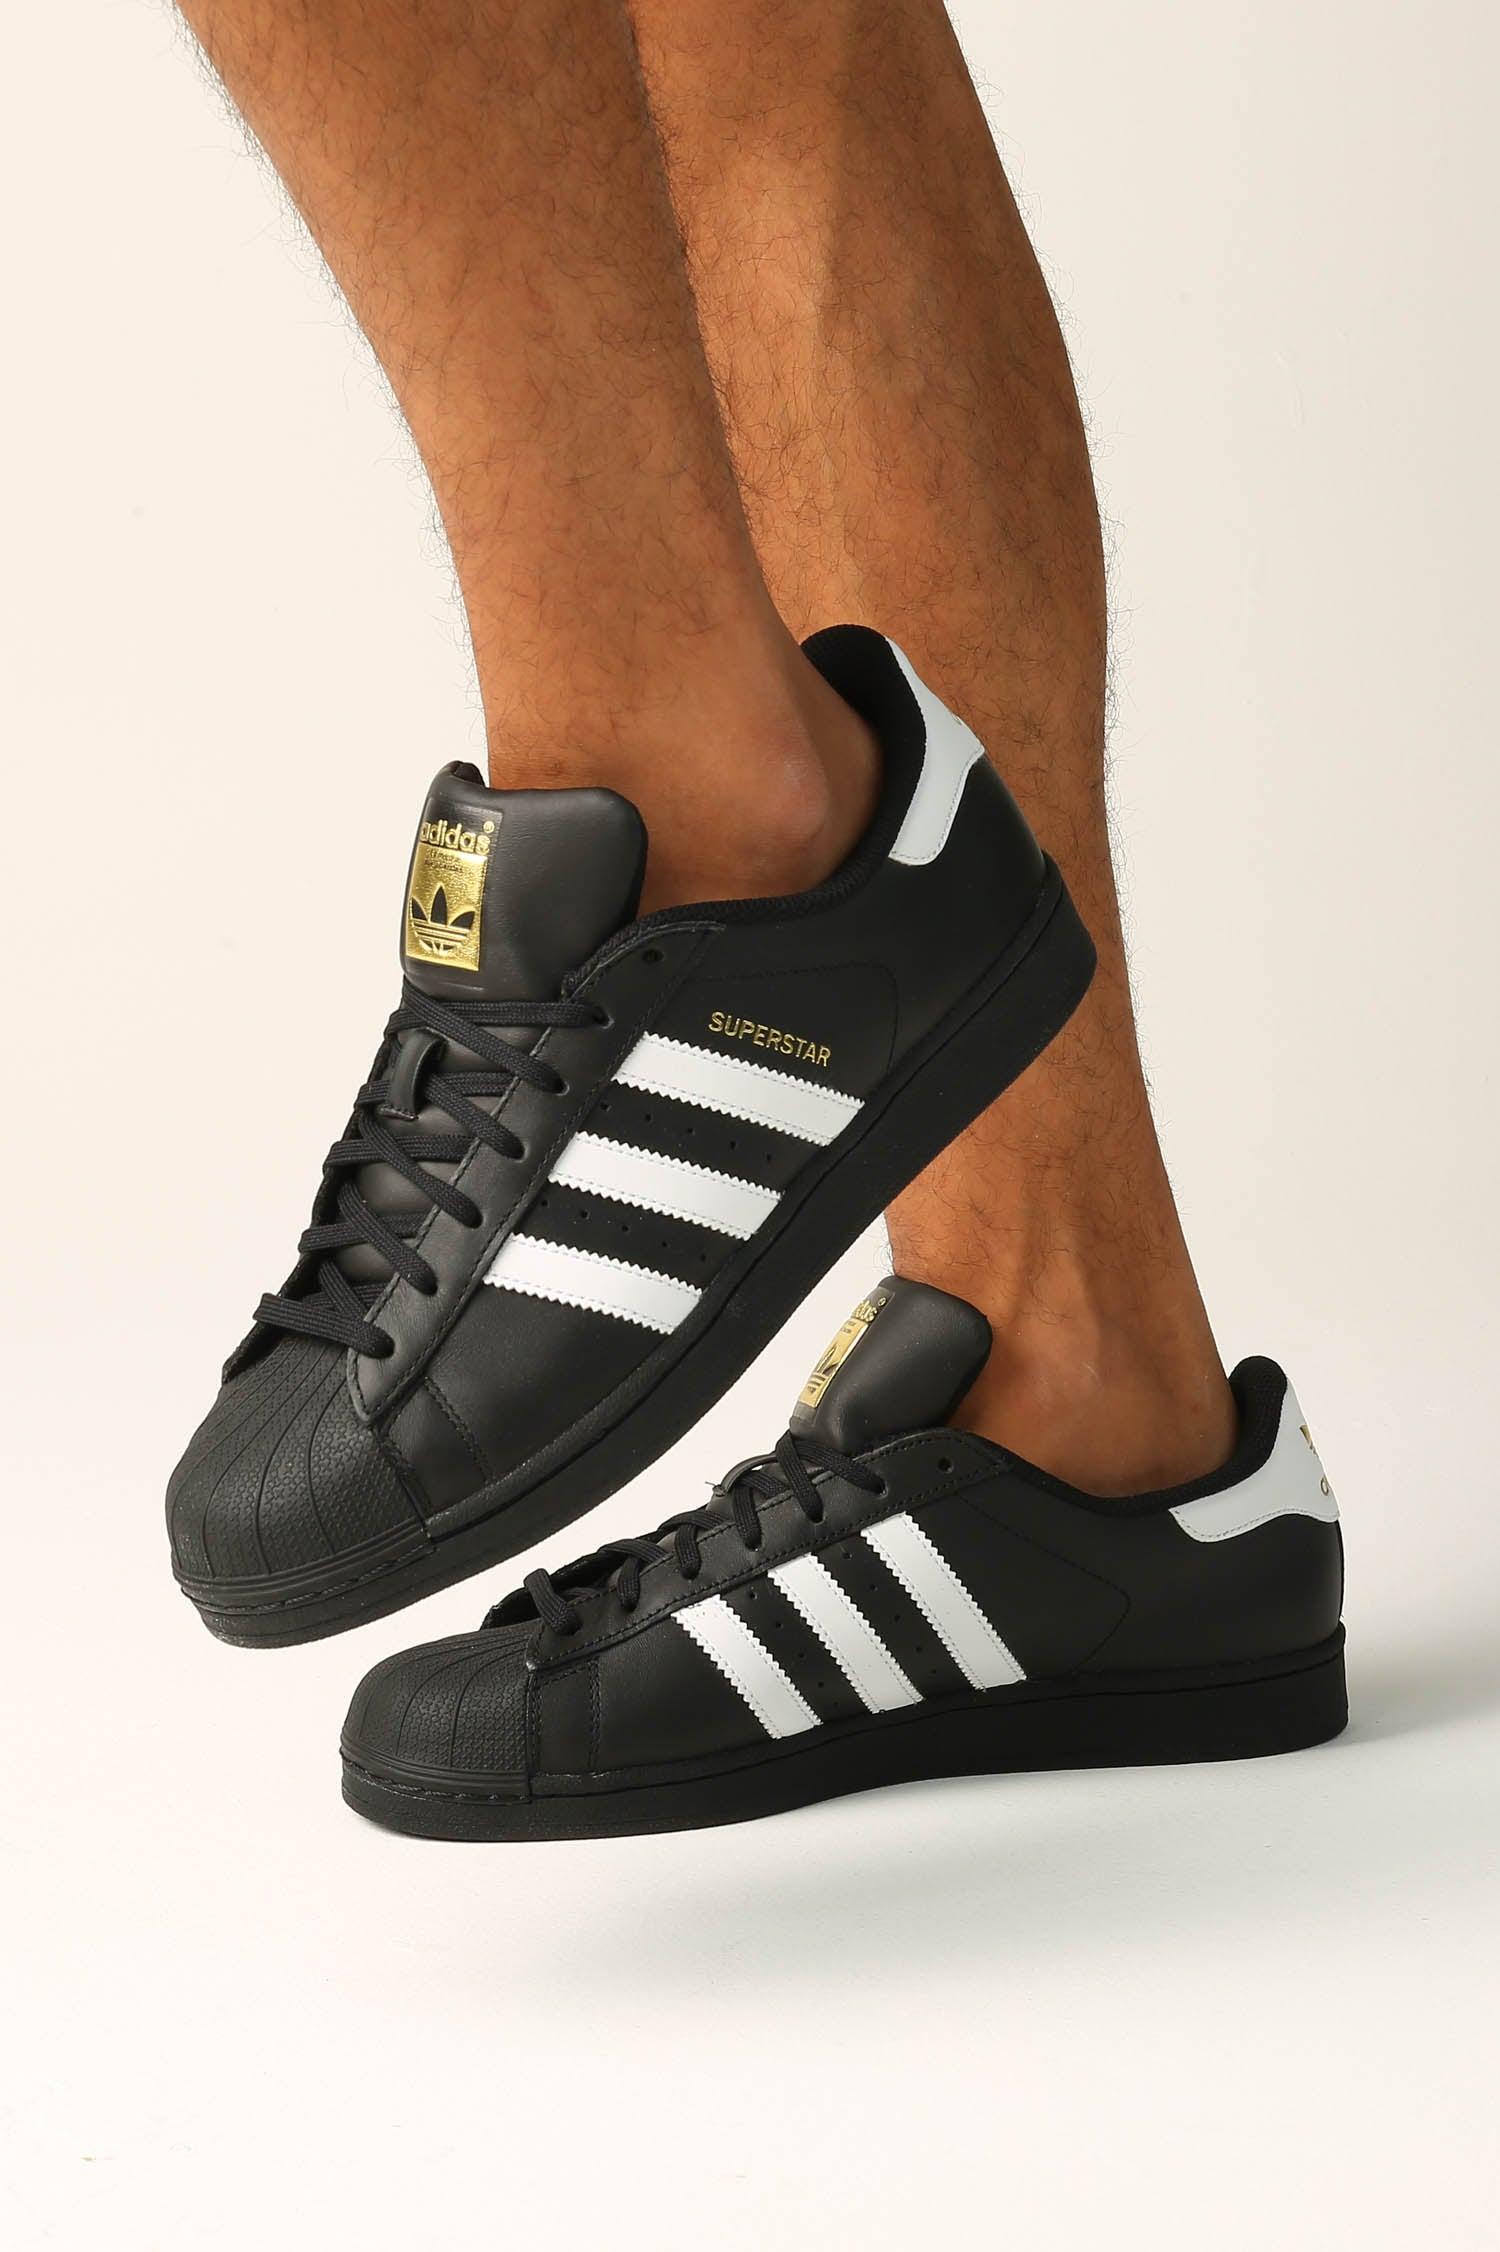 Superstar Foundation Shoe Black/white